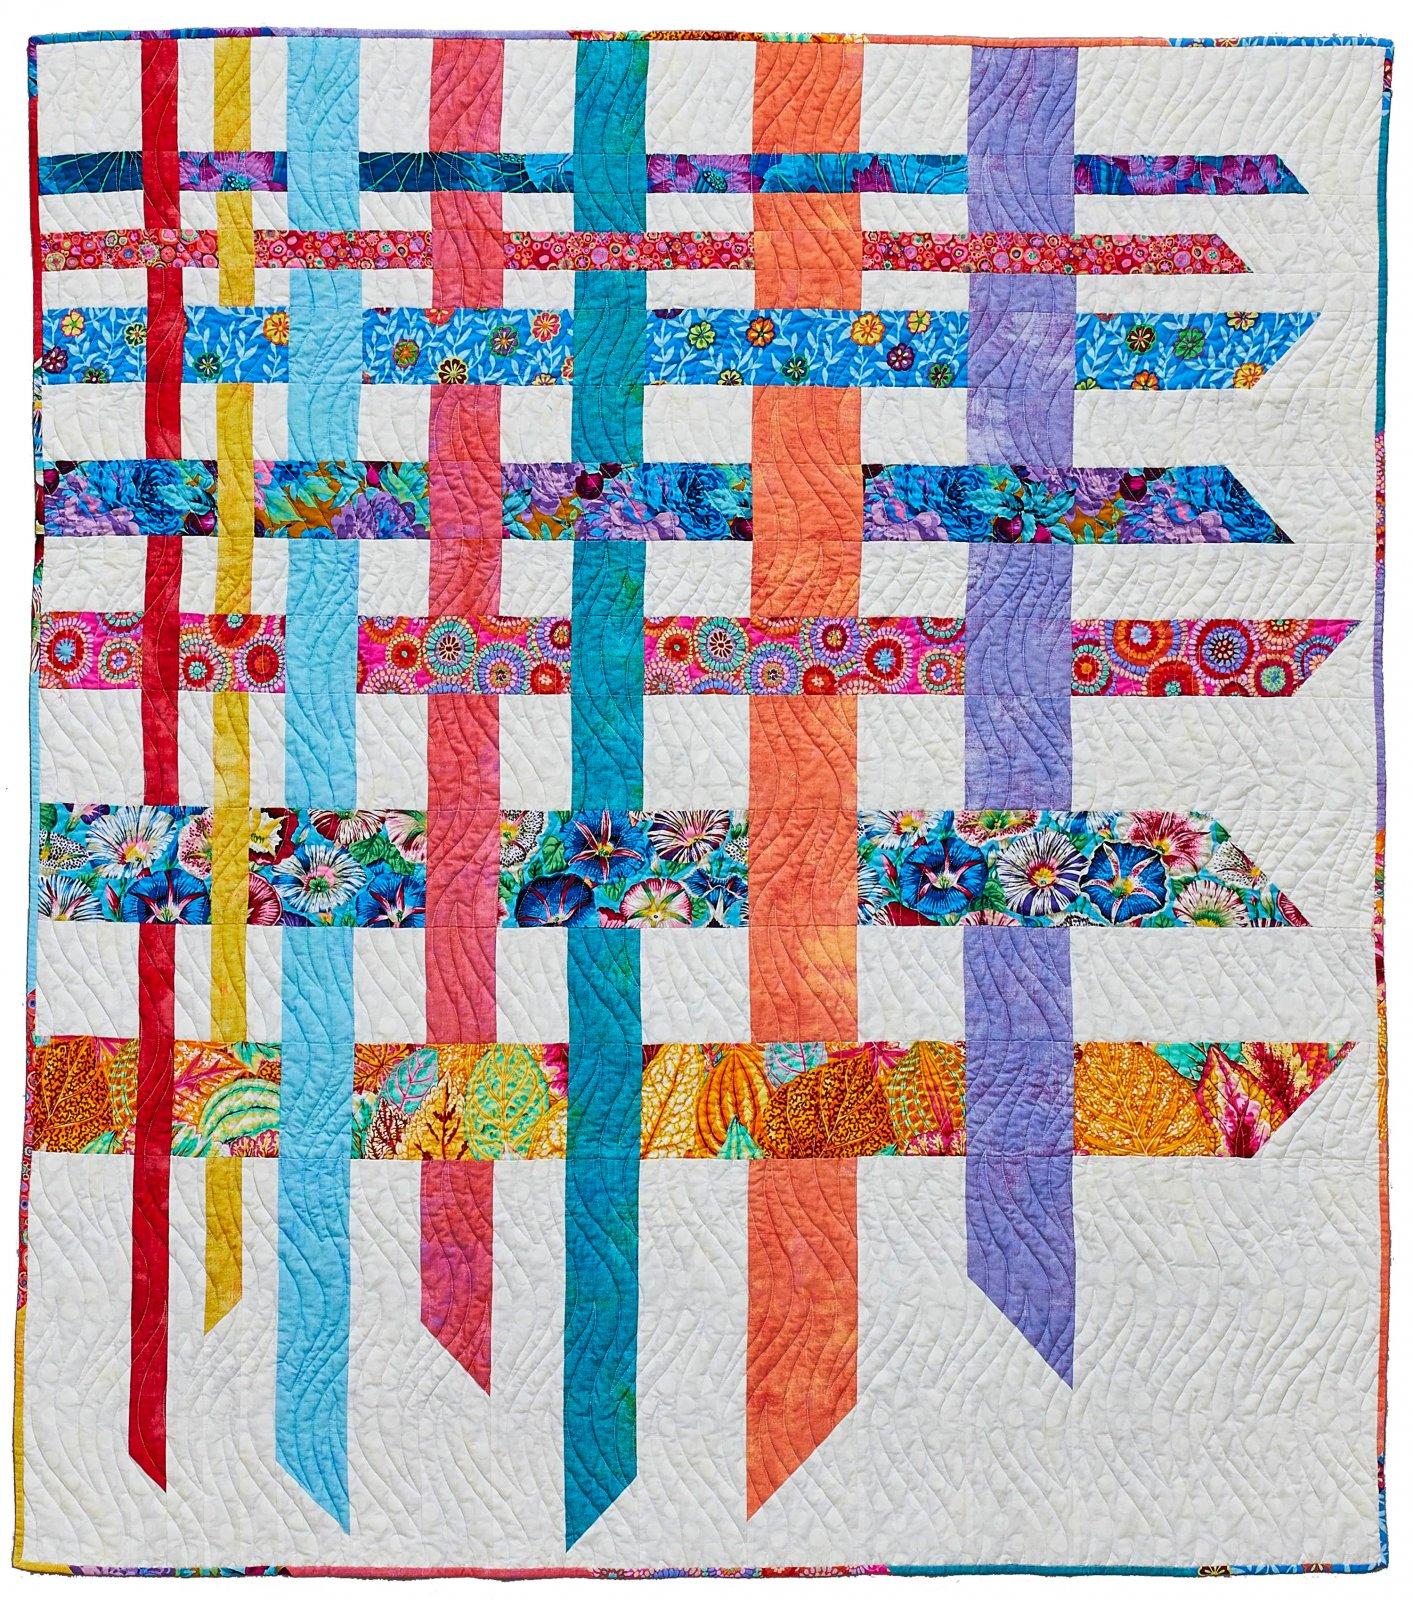 Washi Tape Quilt Kit - Quilt Sampler Quilt